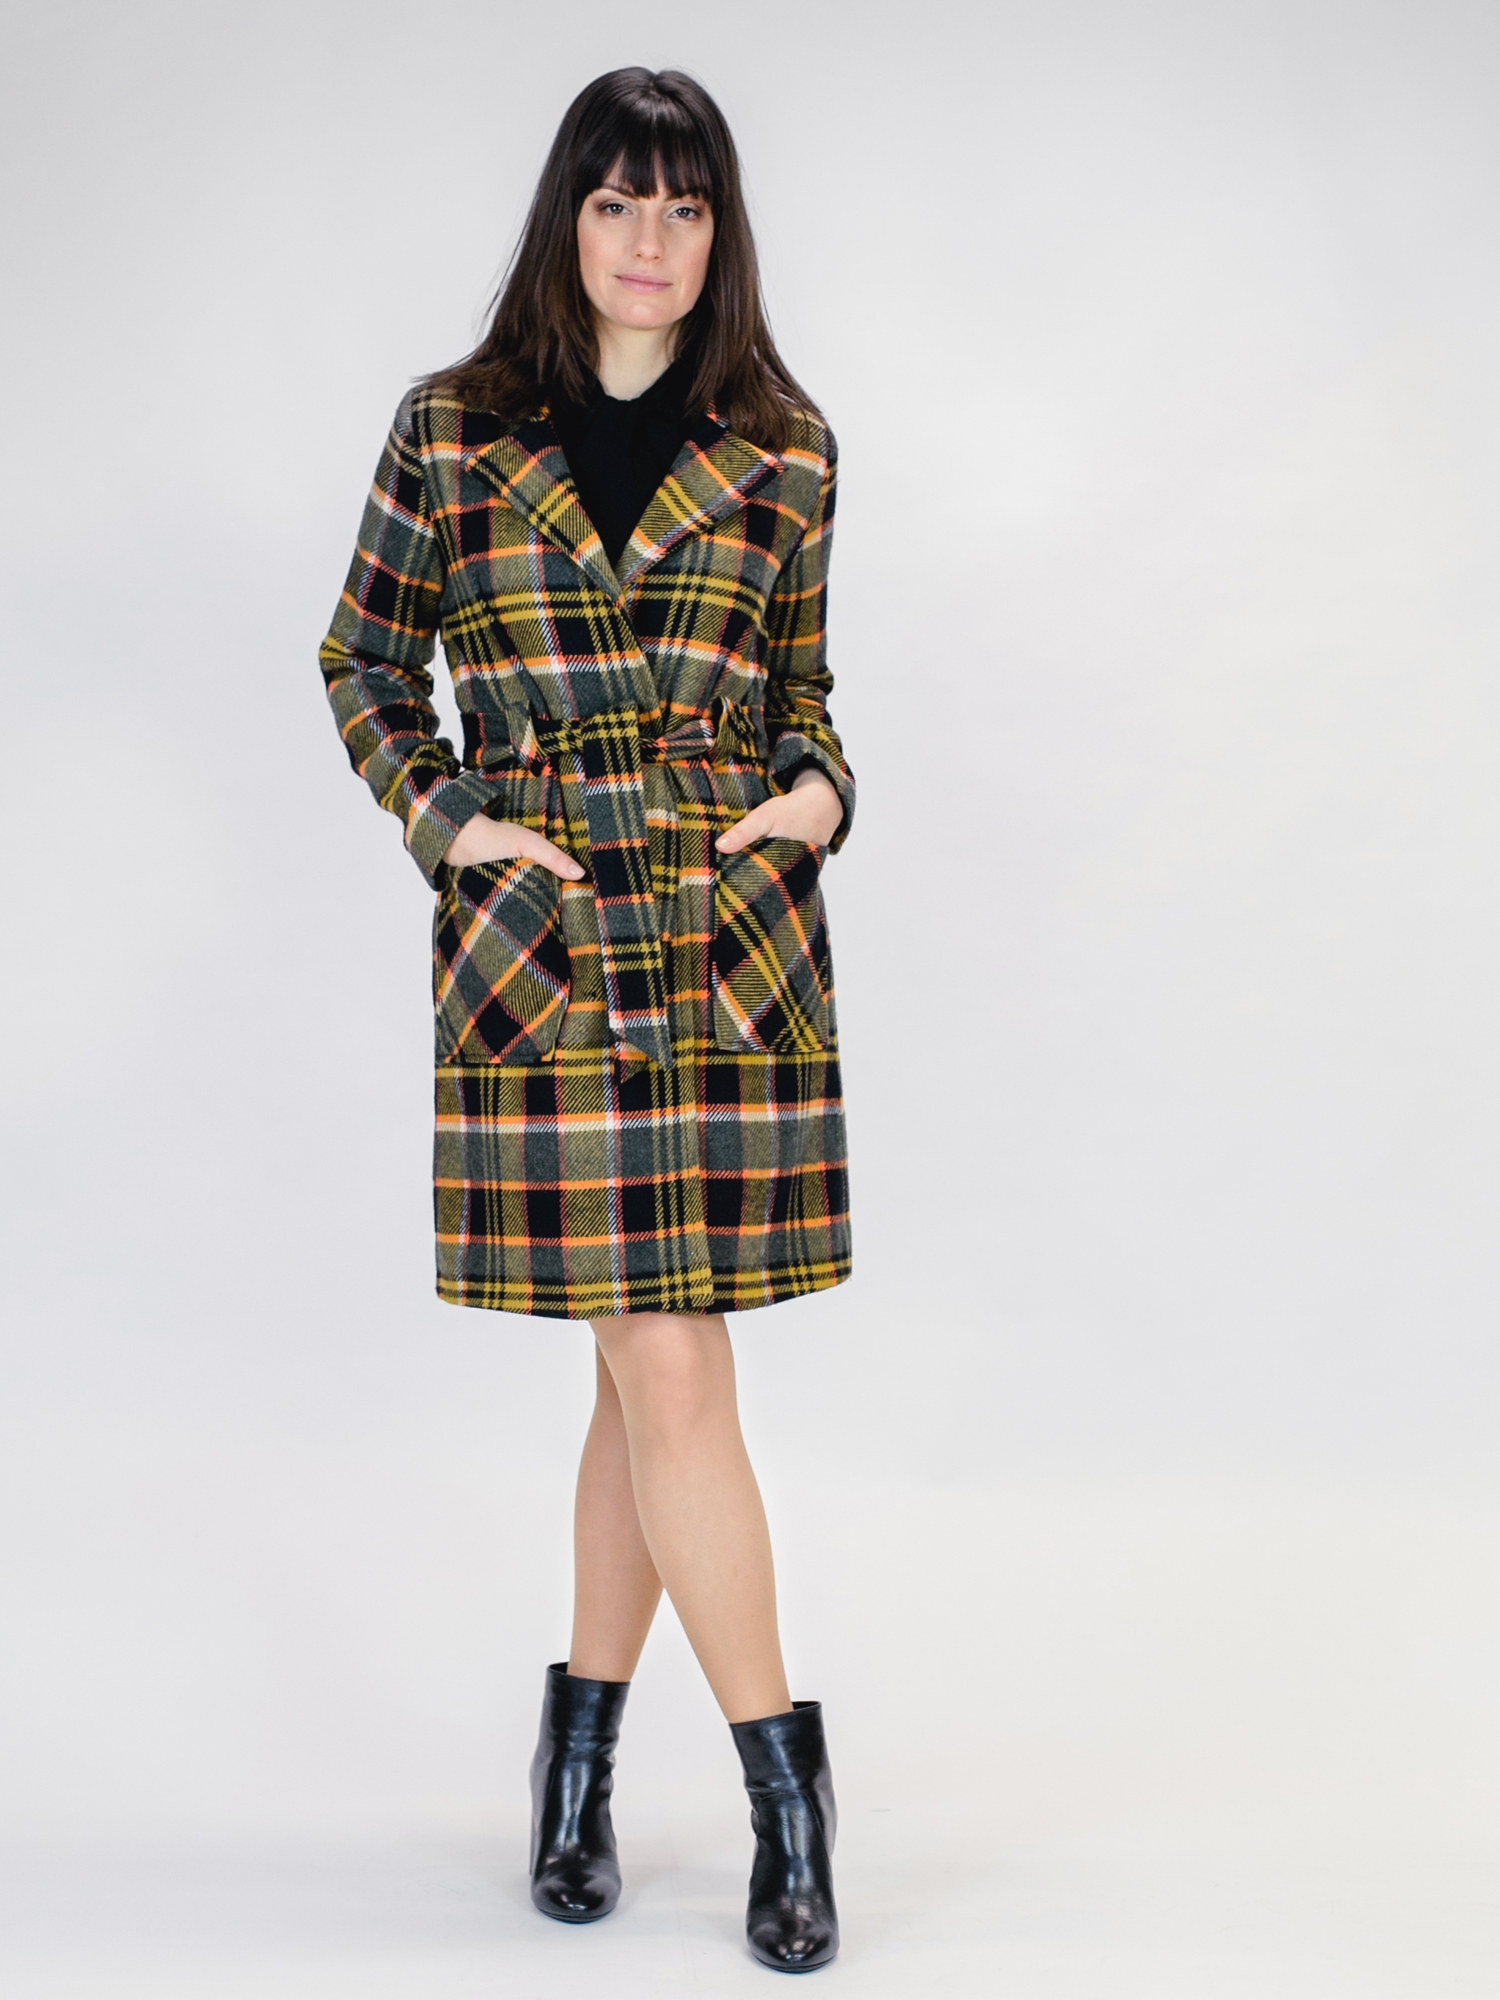 MADEMOISELLE-YEYE-LET-s-COZY-UP-COAT-Jacke-tartan-black-mustard-4